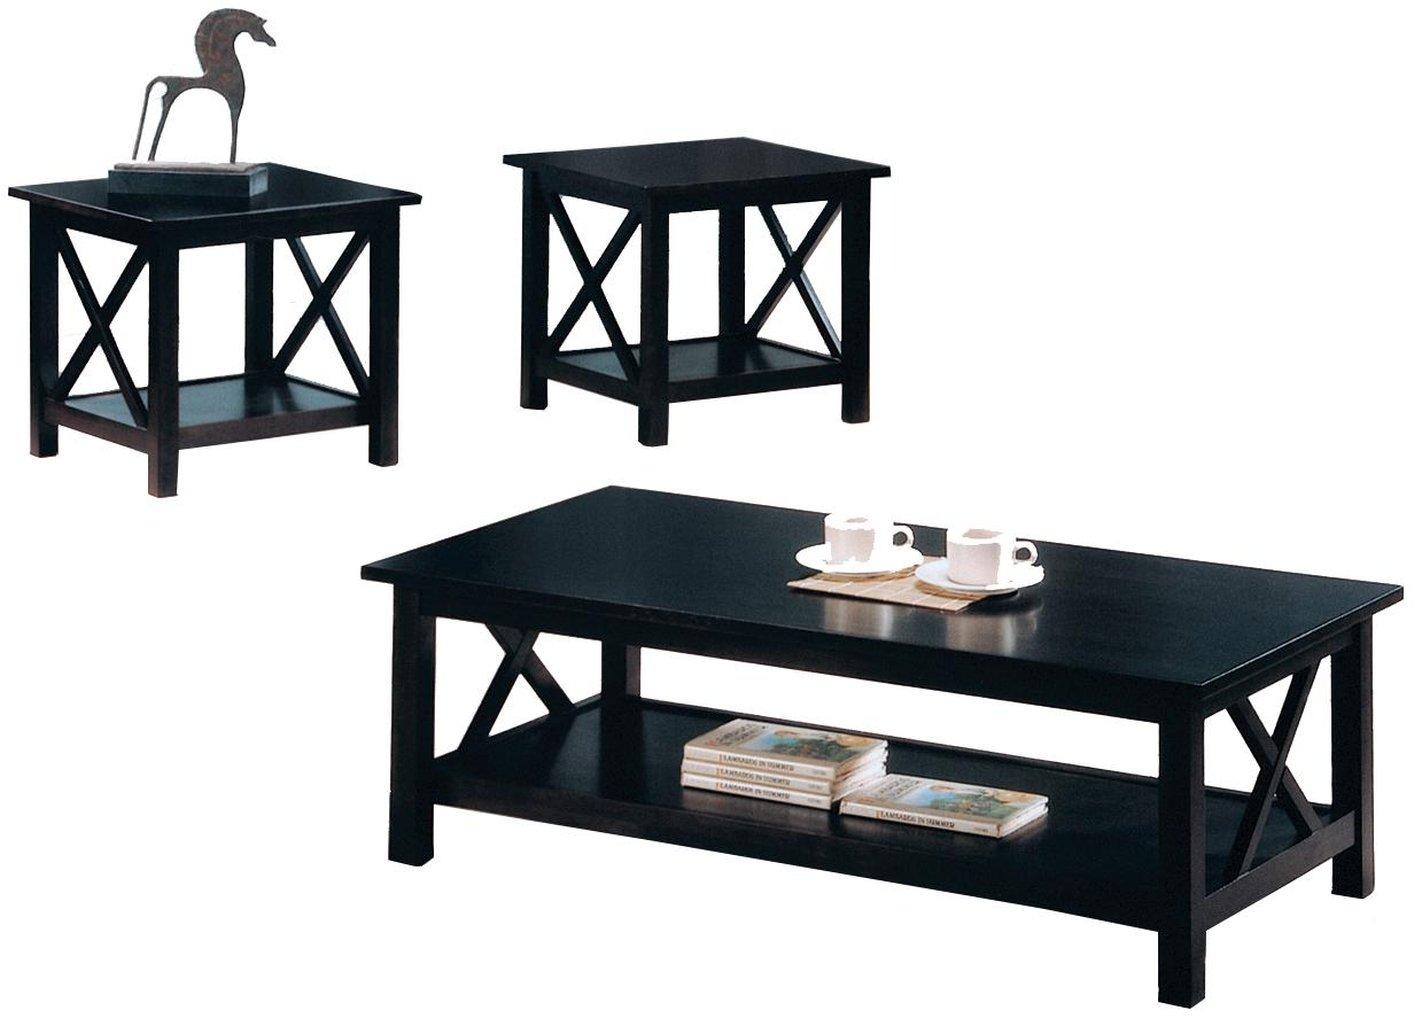 Coffee table sets Black wood coffee table set PXKPMVY